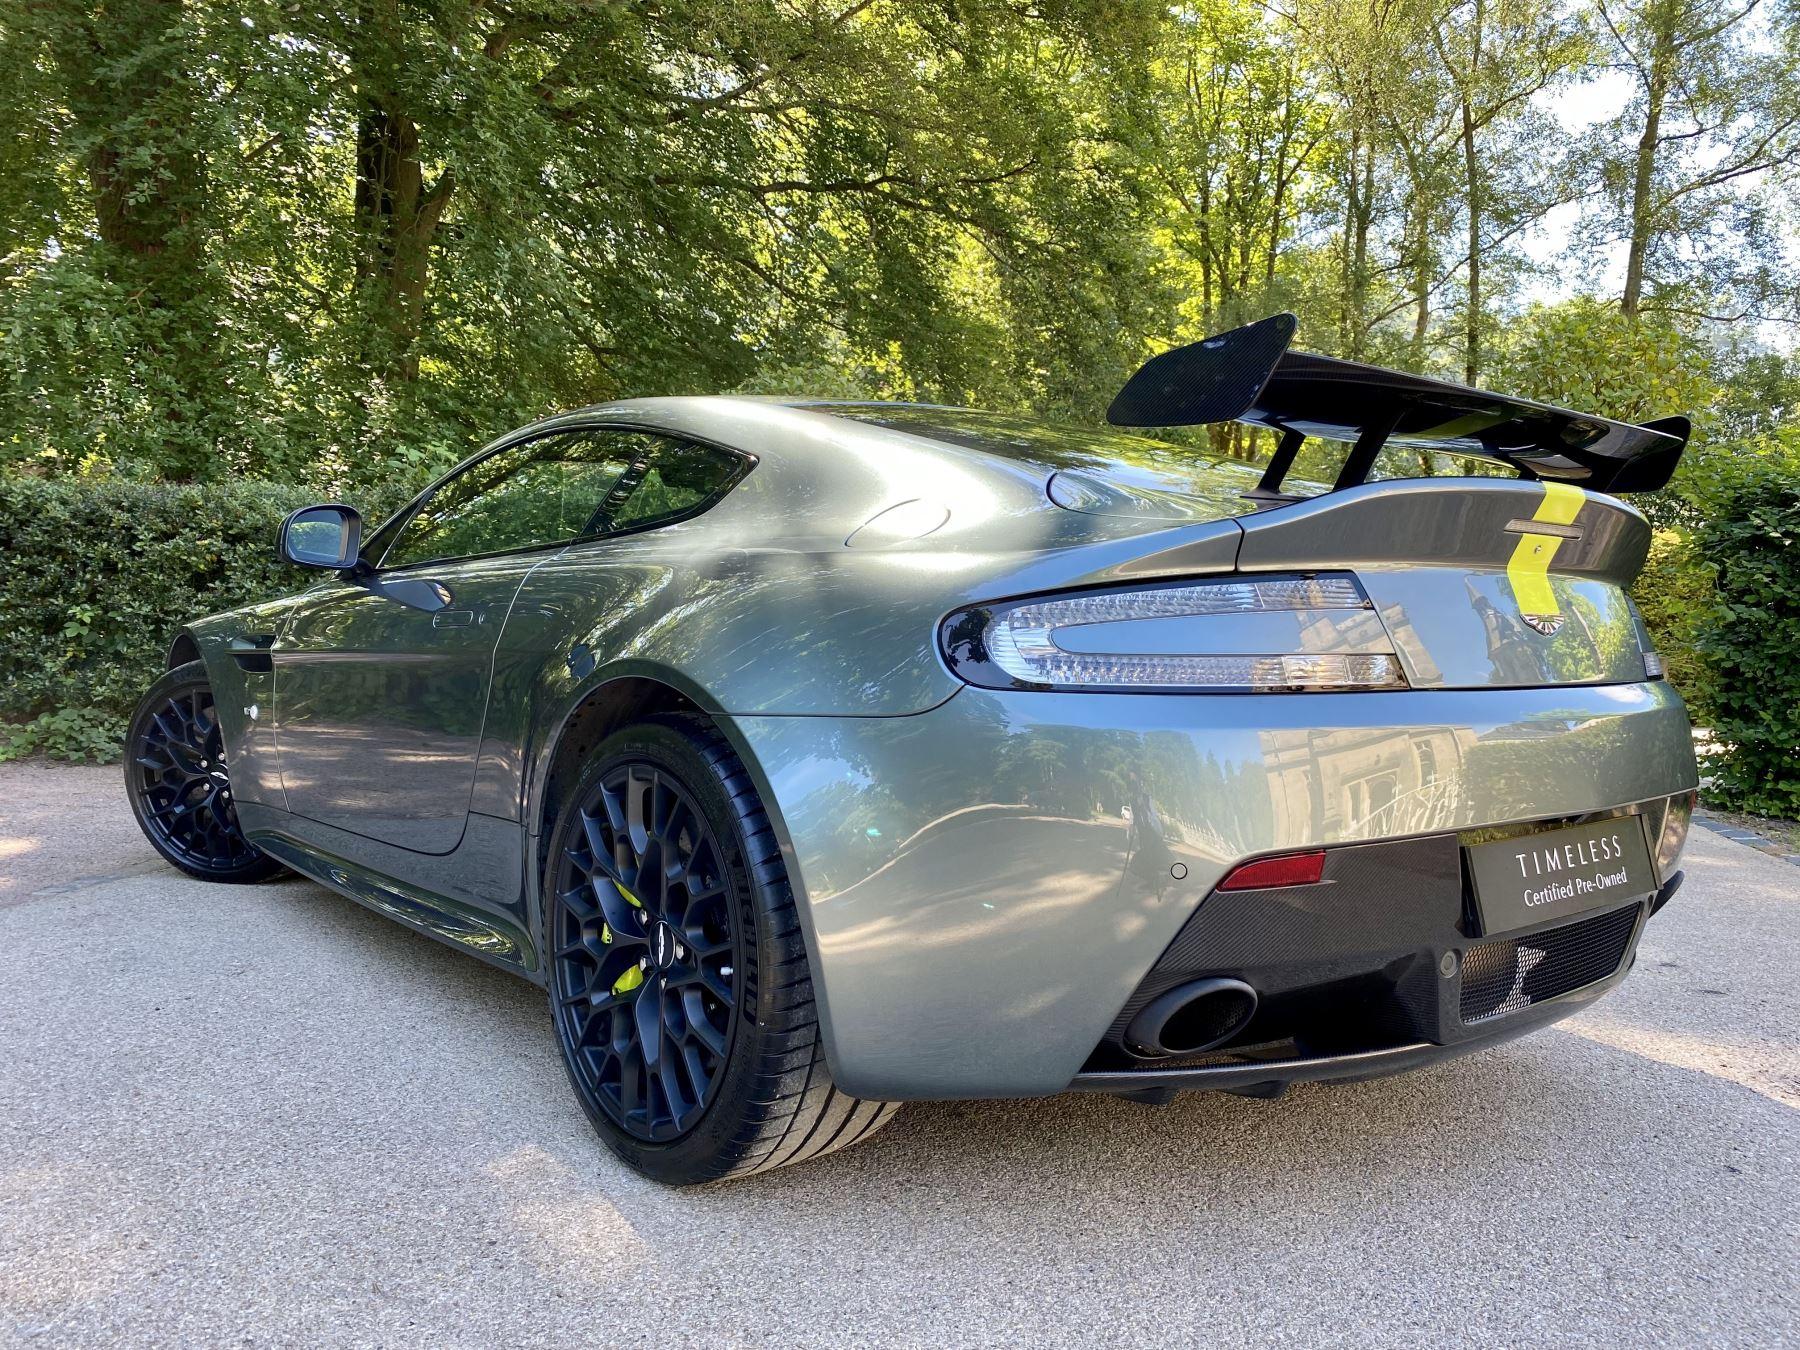 Aston Martin V12 Vantage AMR 6.0 V12 600BHP Manual 1 of 100.     1 Owner From New, Full Aston Martin History. image 5